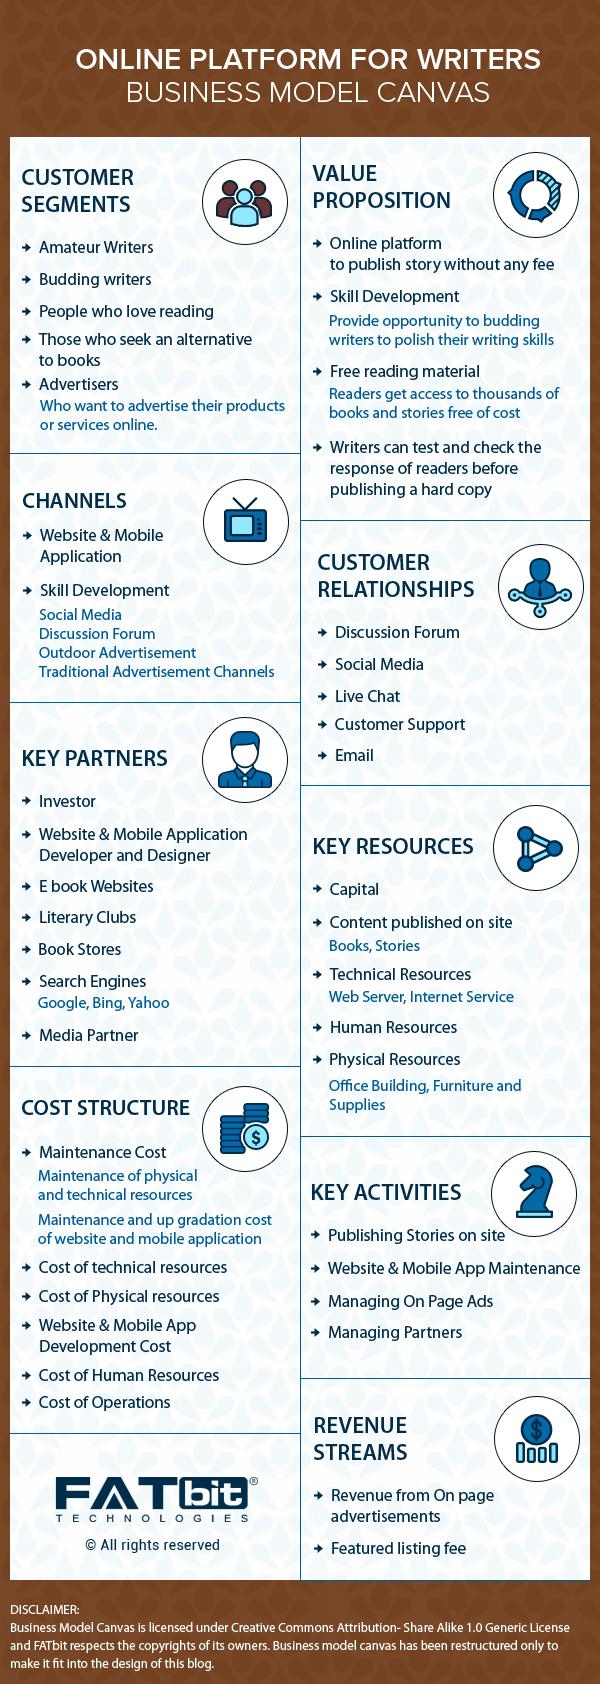 Business Model Canvas - Online Writer Community